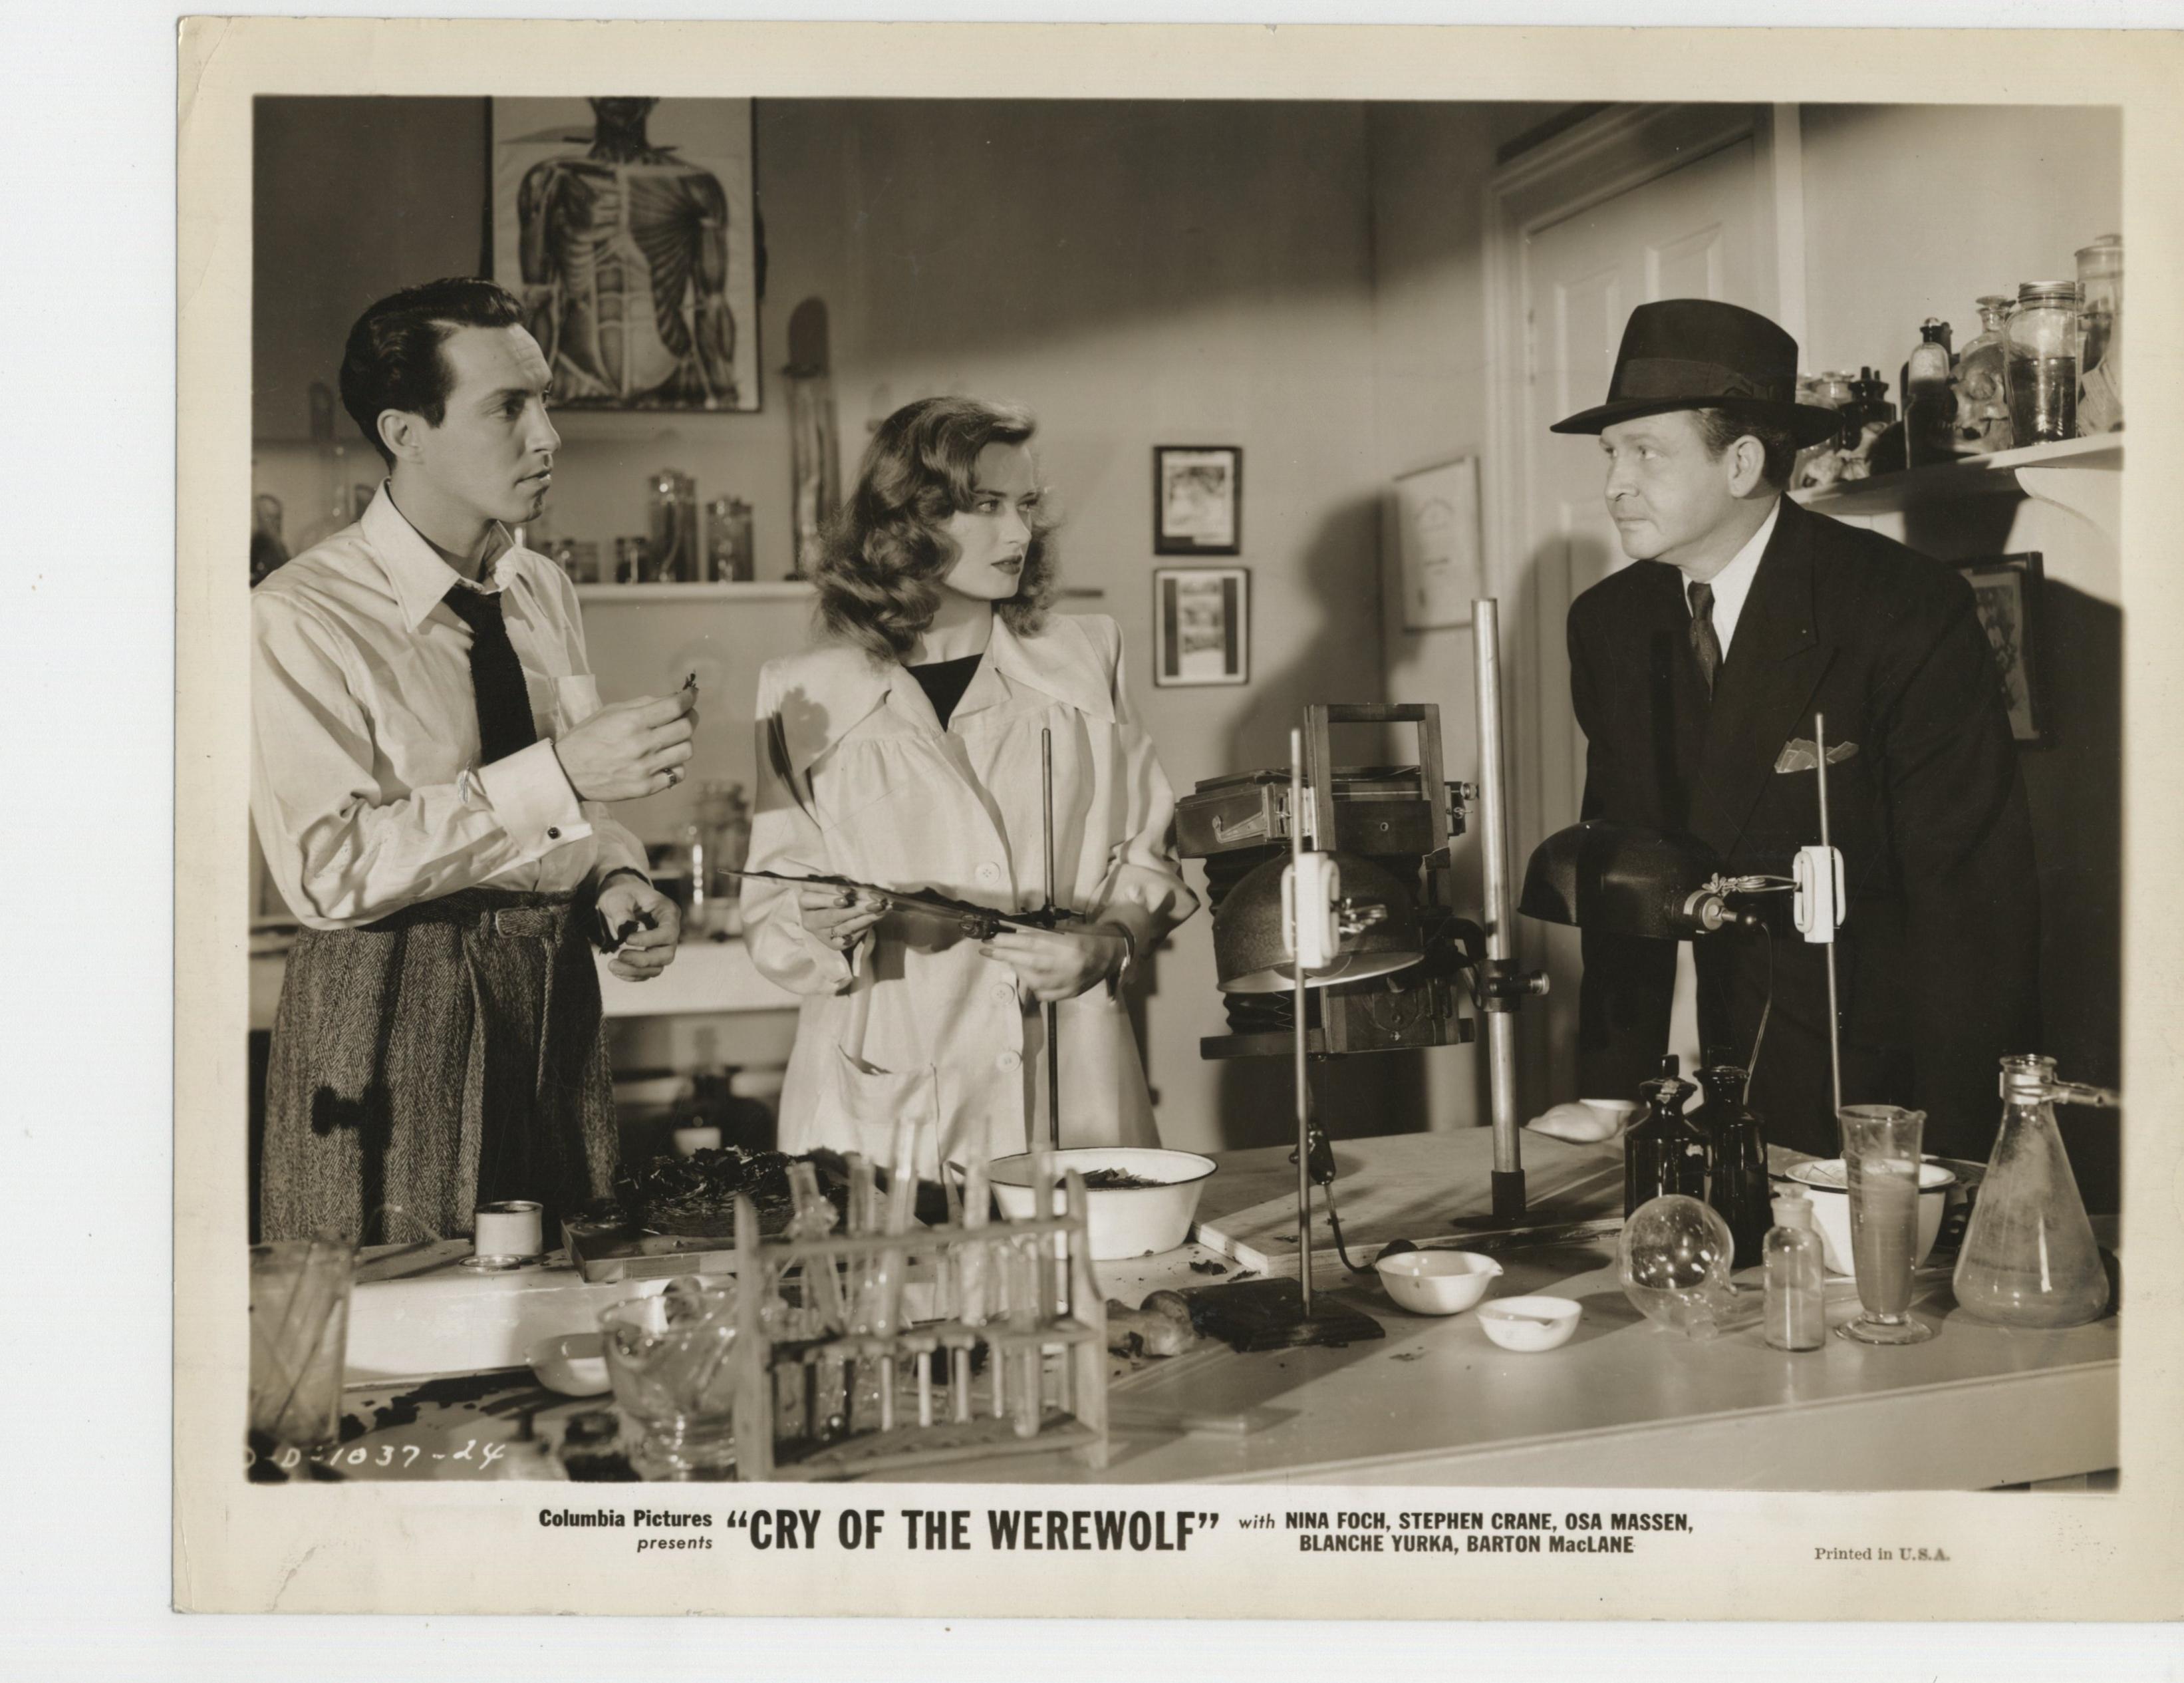 Stephen Crane, Barton MacLane, and Osa Massen in Cry of the Werewolf (1944)